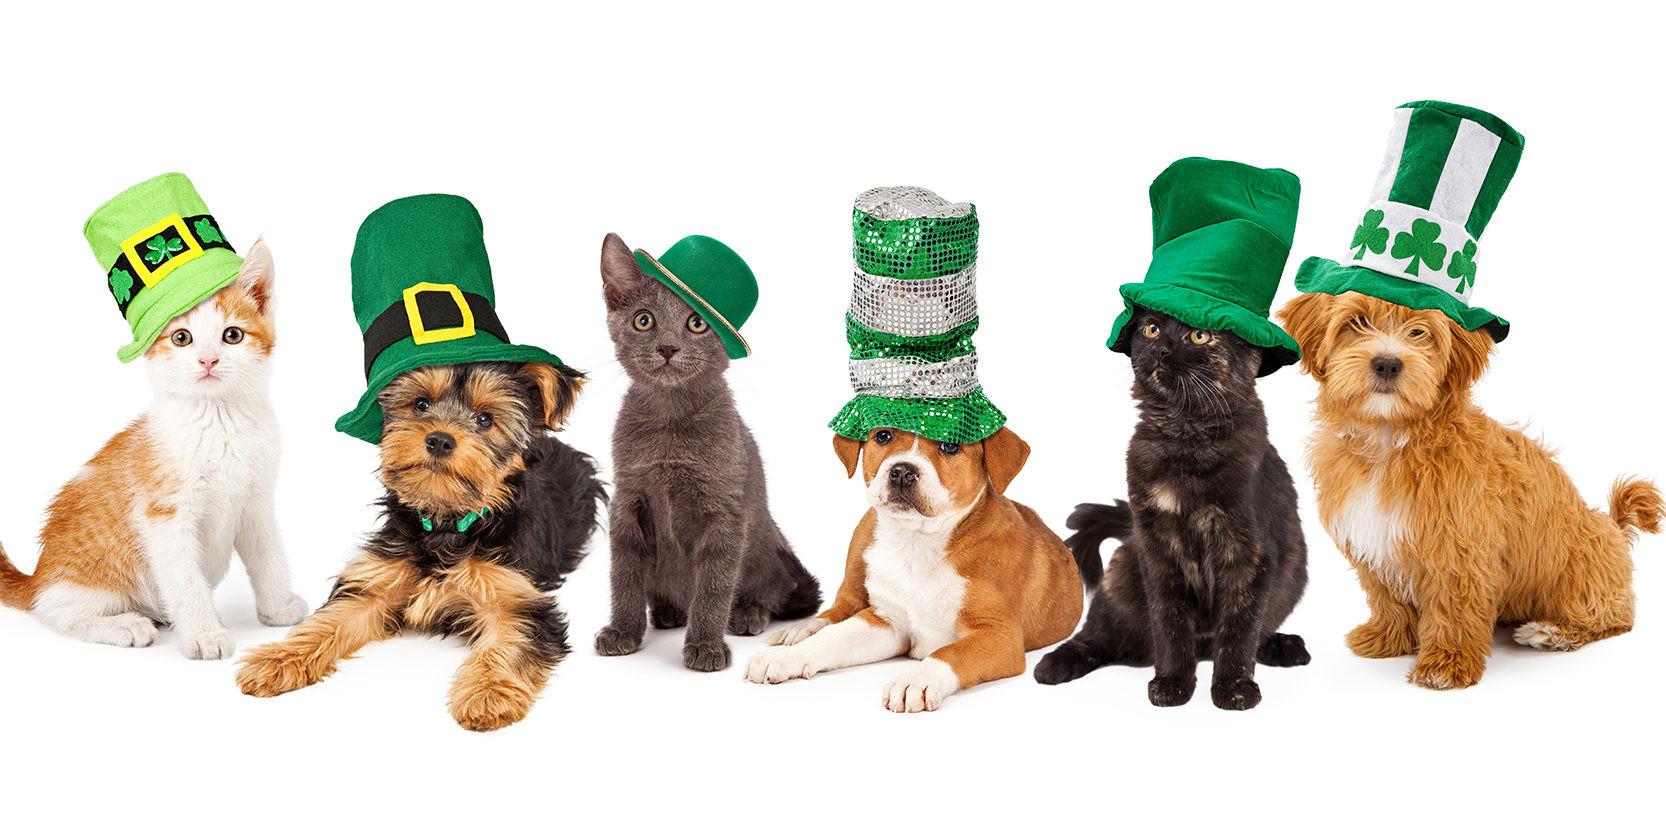 St-Patricks-Day-dogs_small-1666x833.jpg